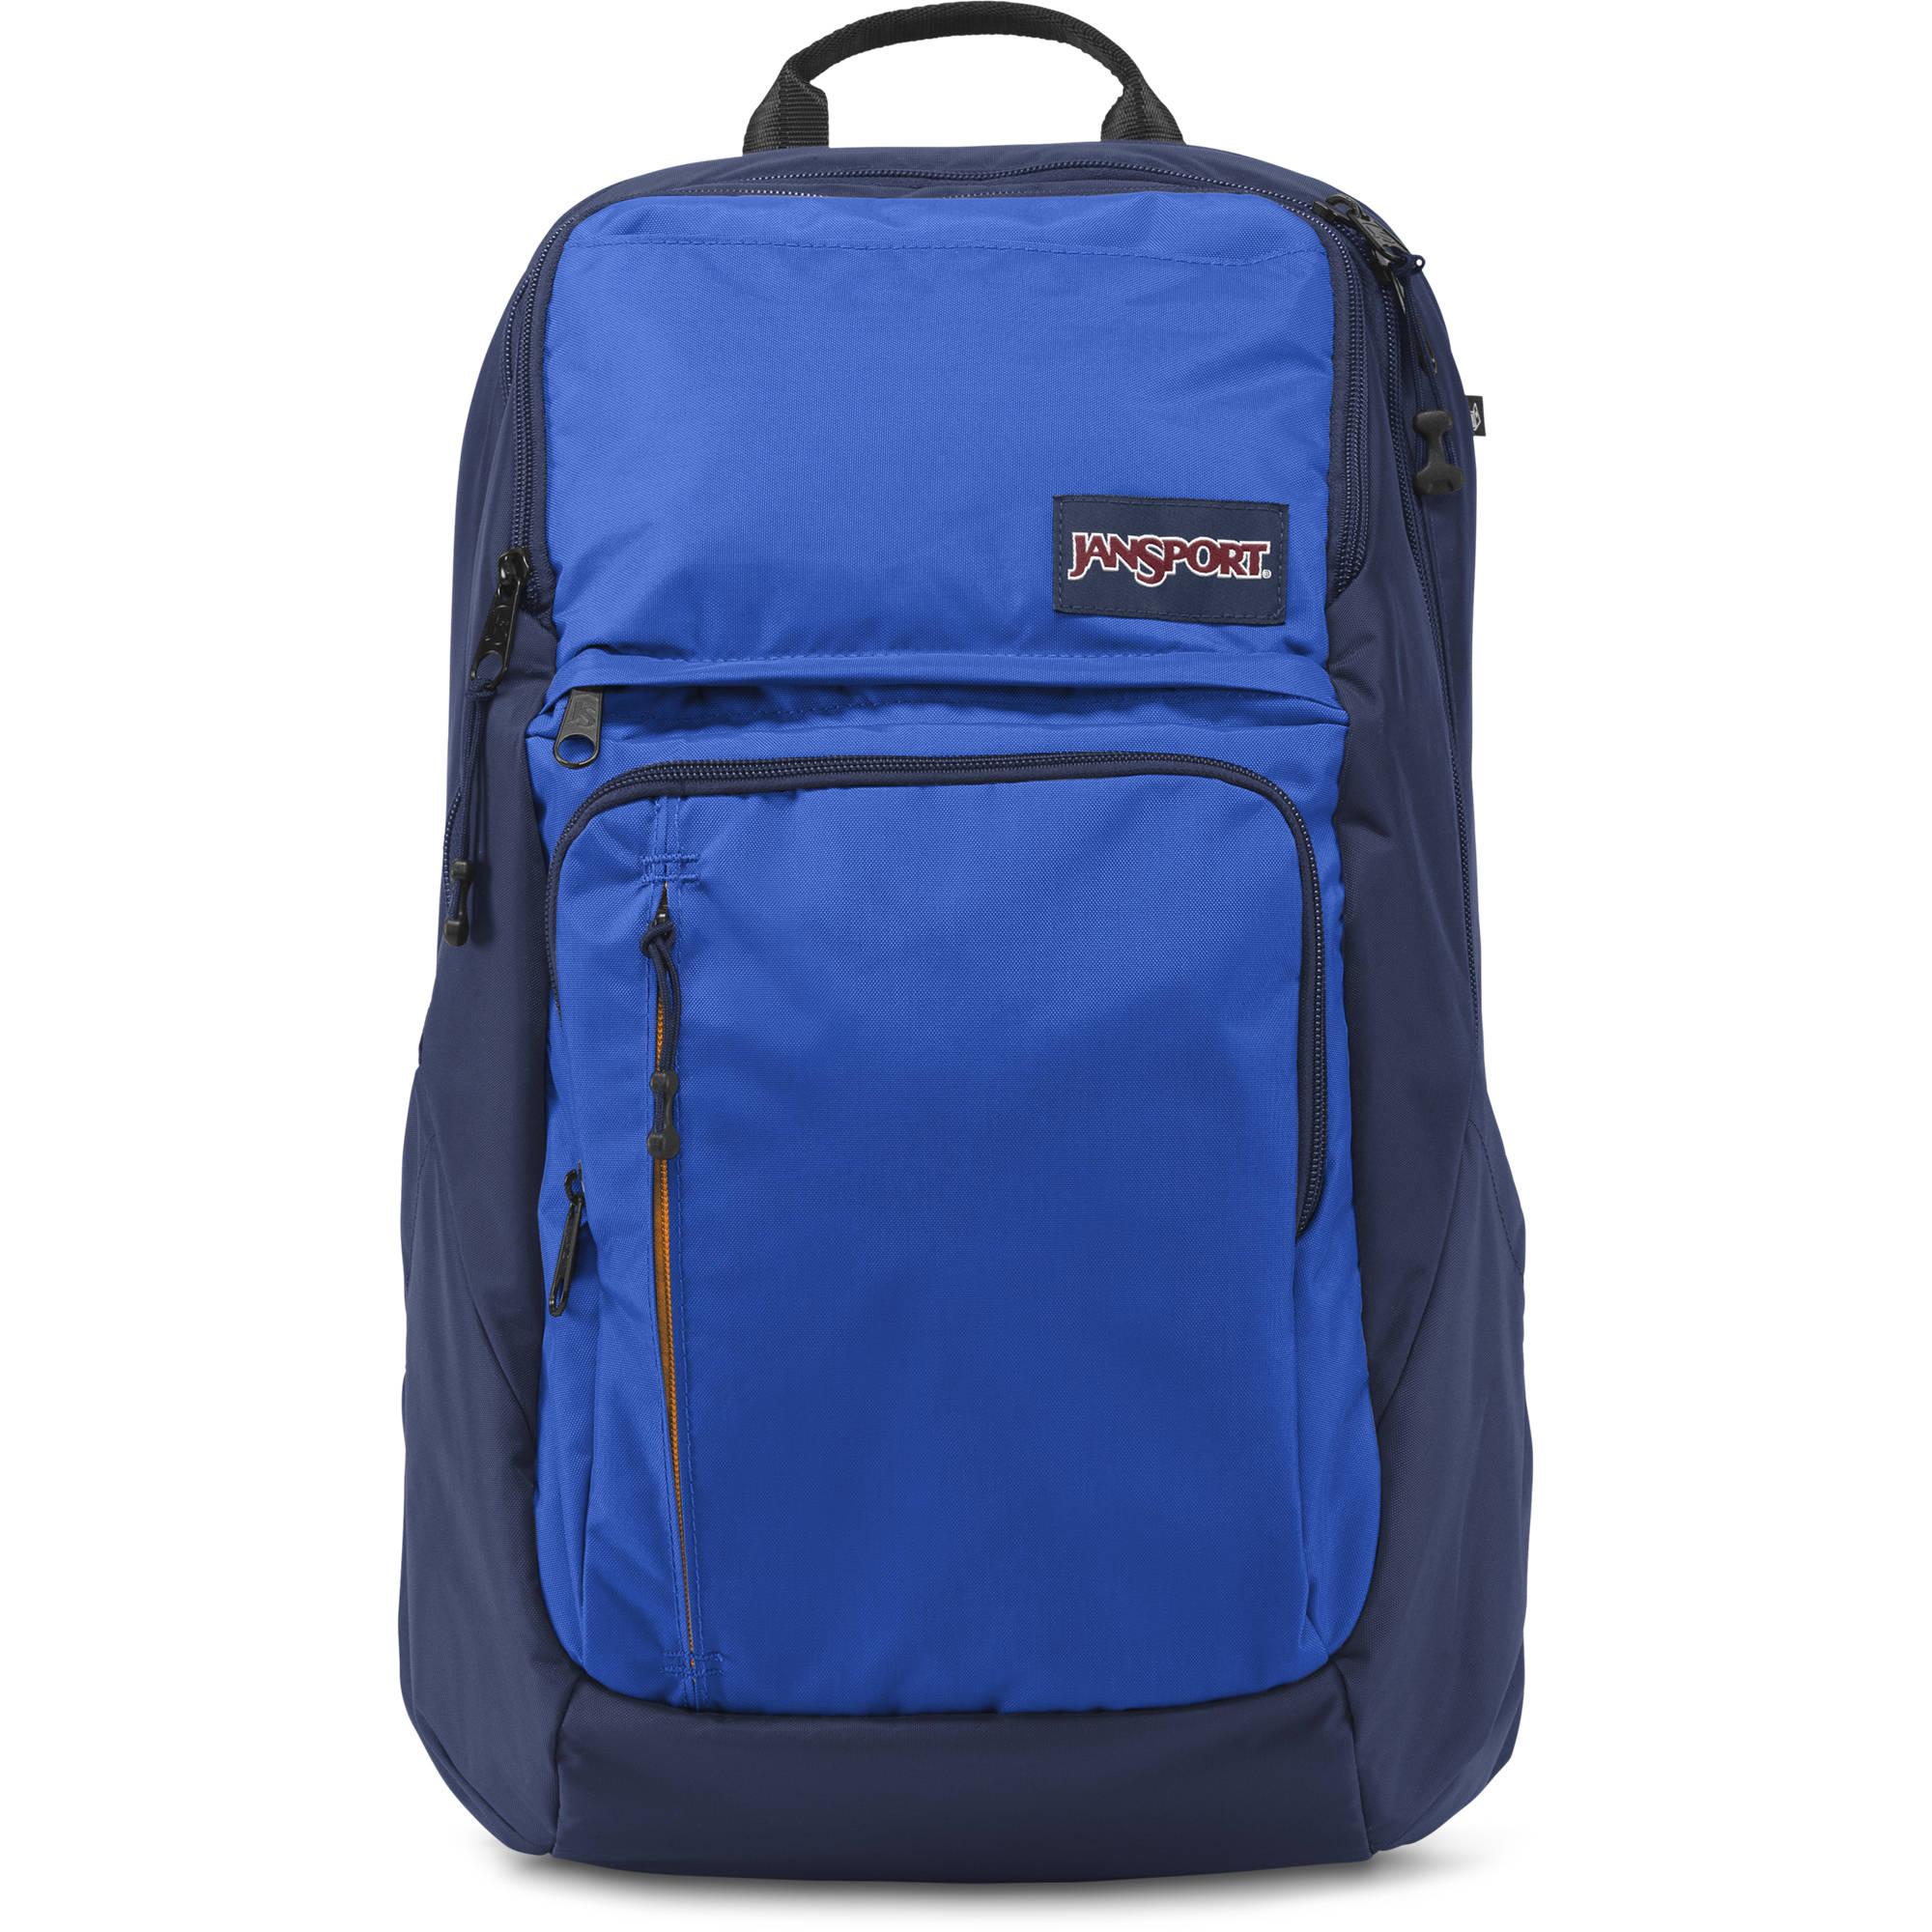 b80a50d38 JanSport Broadband 30L Backpack (Blue Streak) T68S5CS B&H Photo